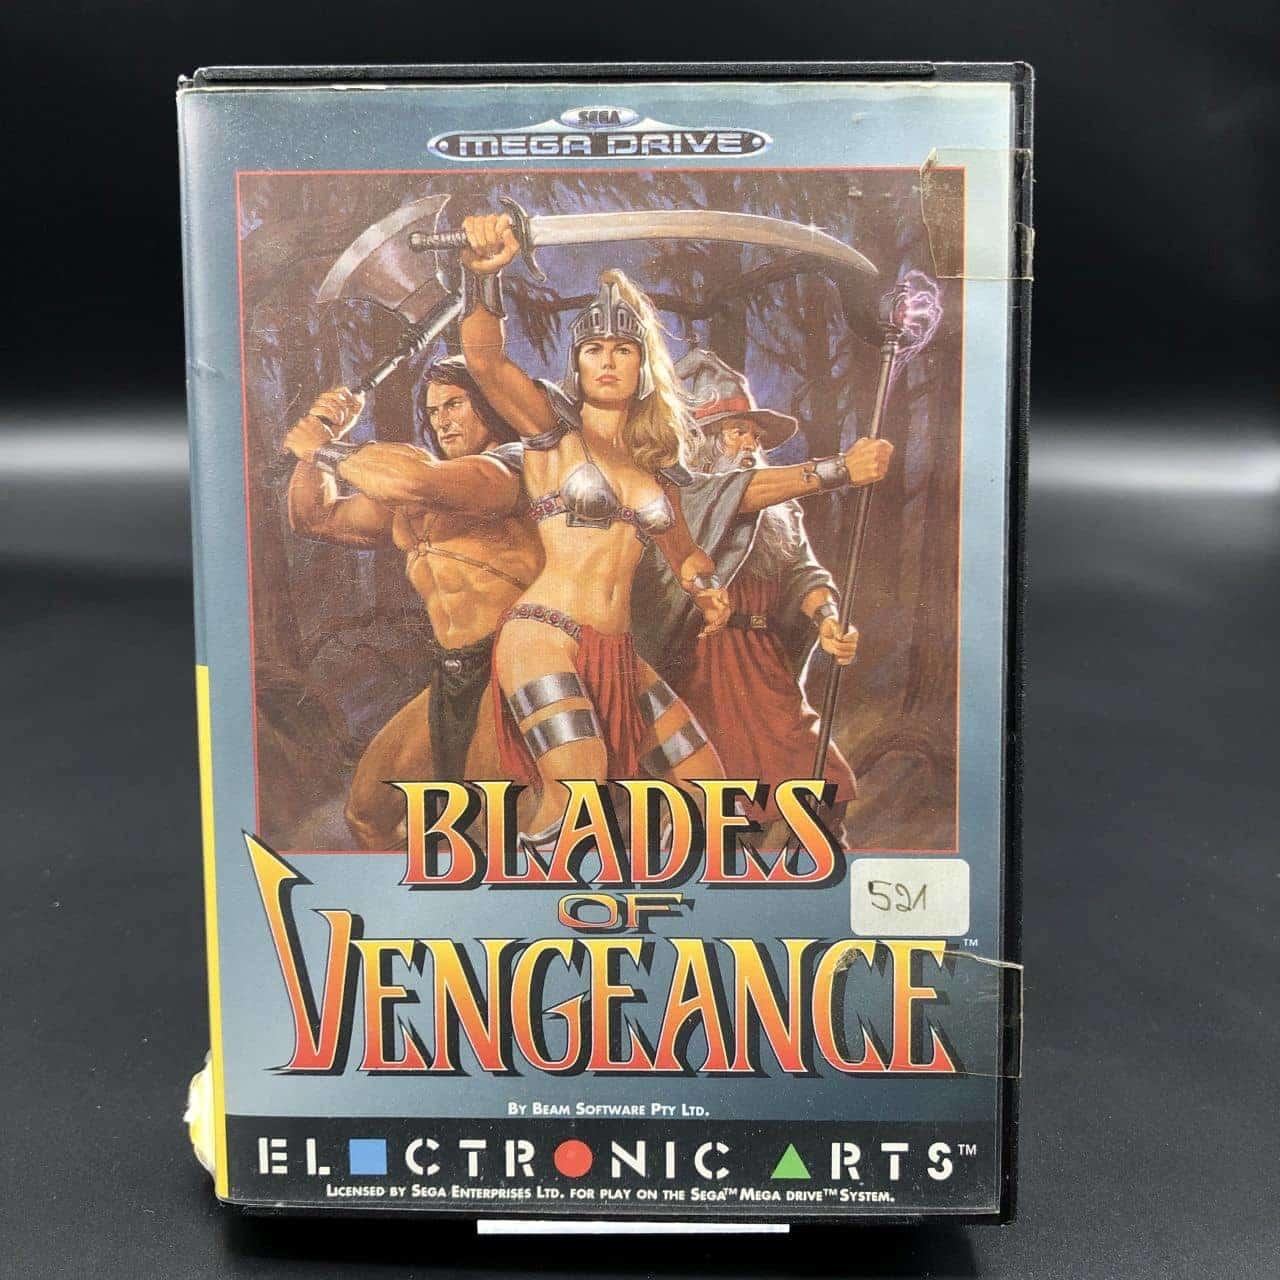 Blades of Vengeance (Komplett) (Gebrauchsspuren) Sega Mega Drive